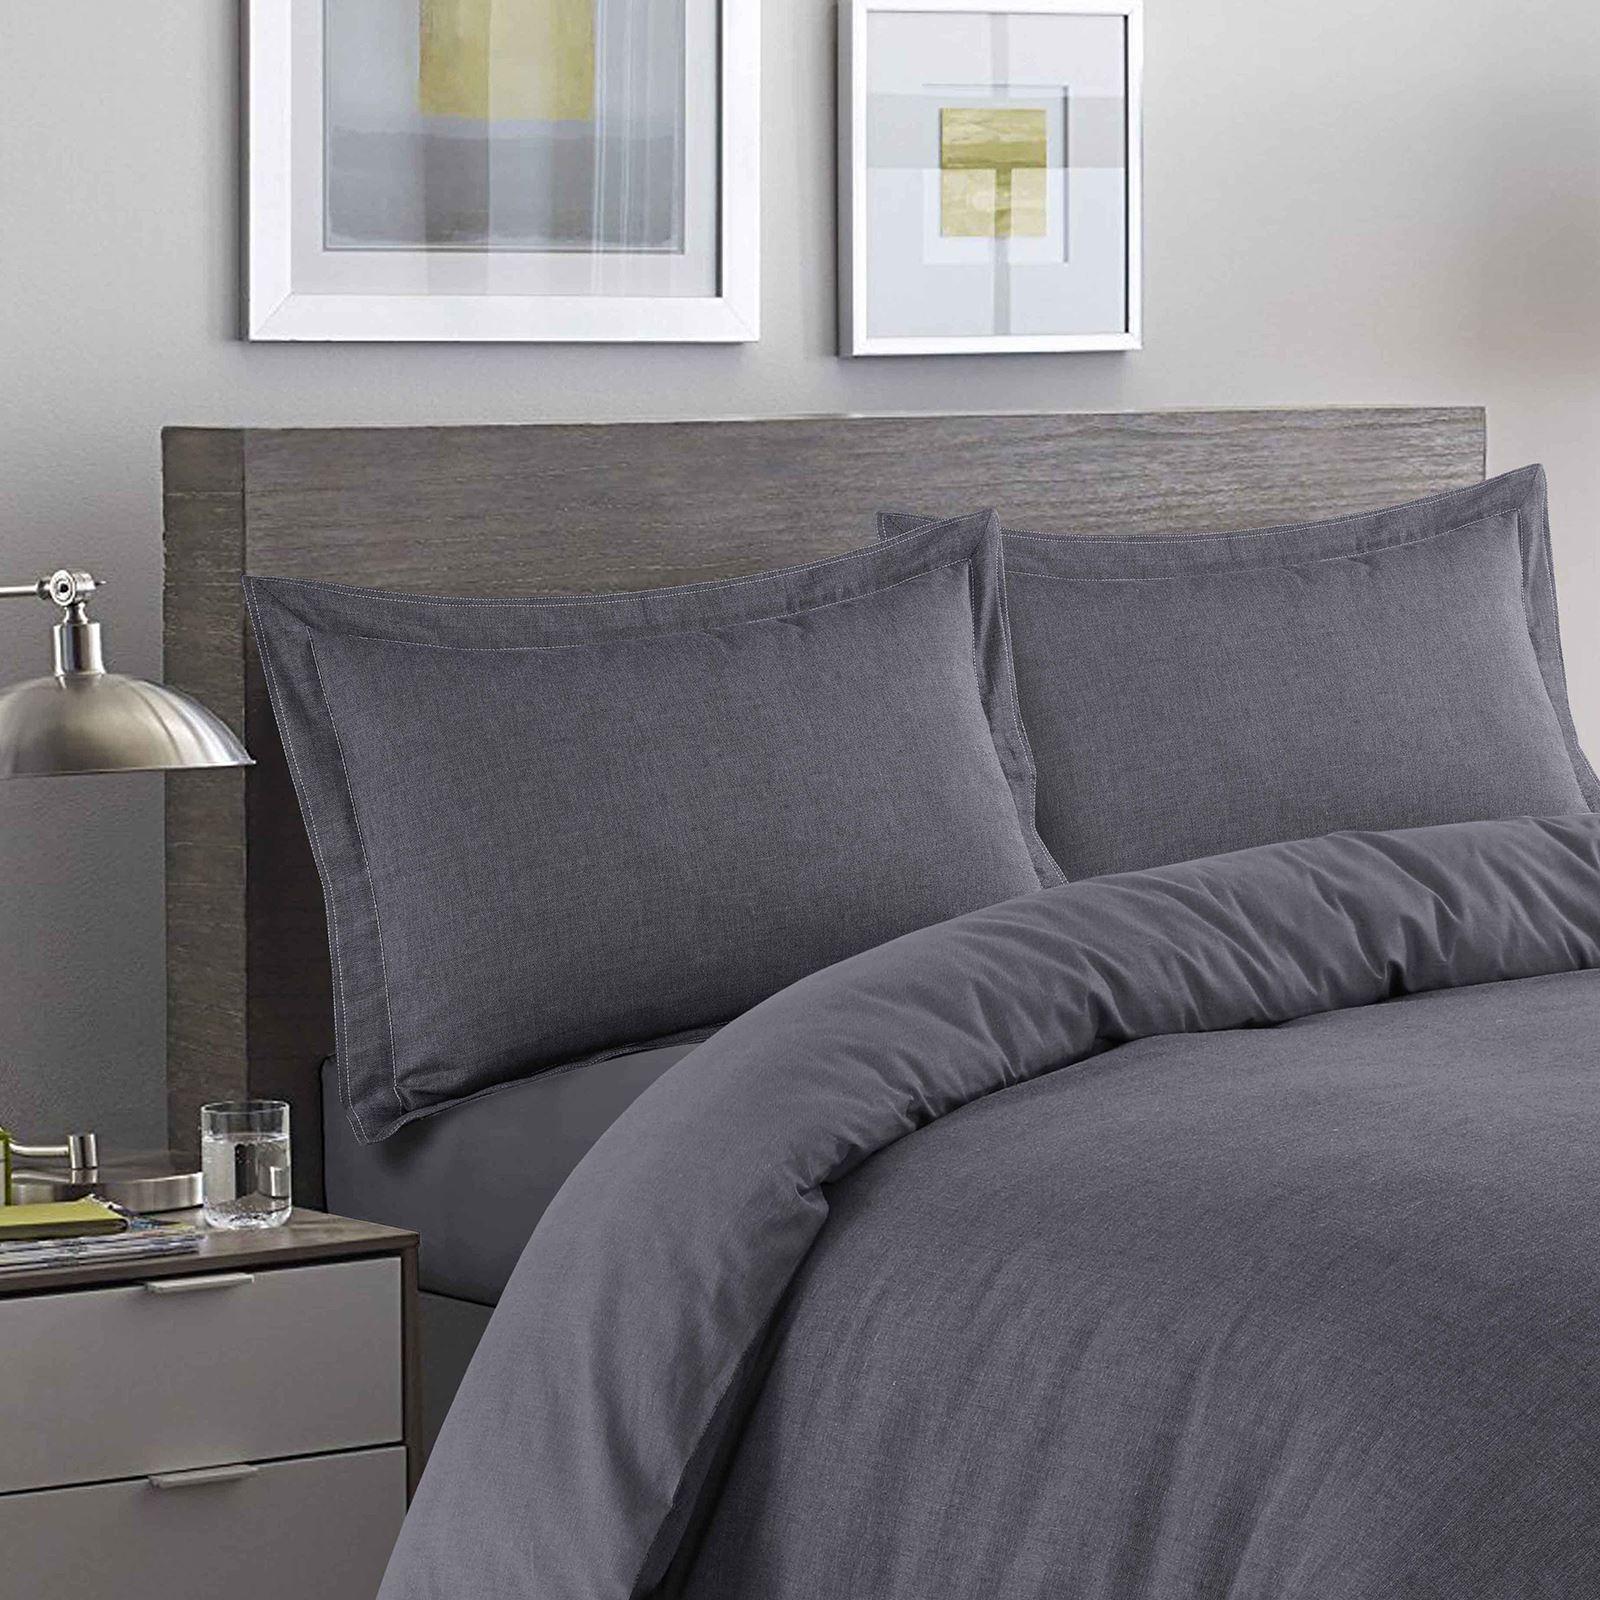 Luxury-Herringbone-Woven-100-Cotton-Duvet-Cover-Bedding-Set-Single-Double-King thumbnail 3